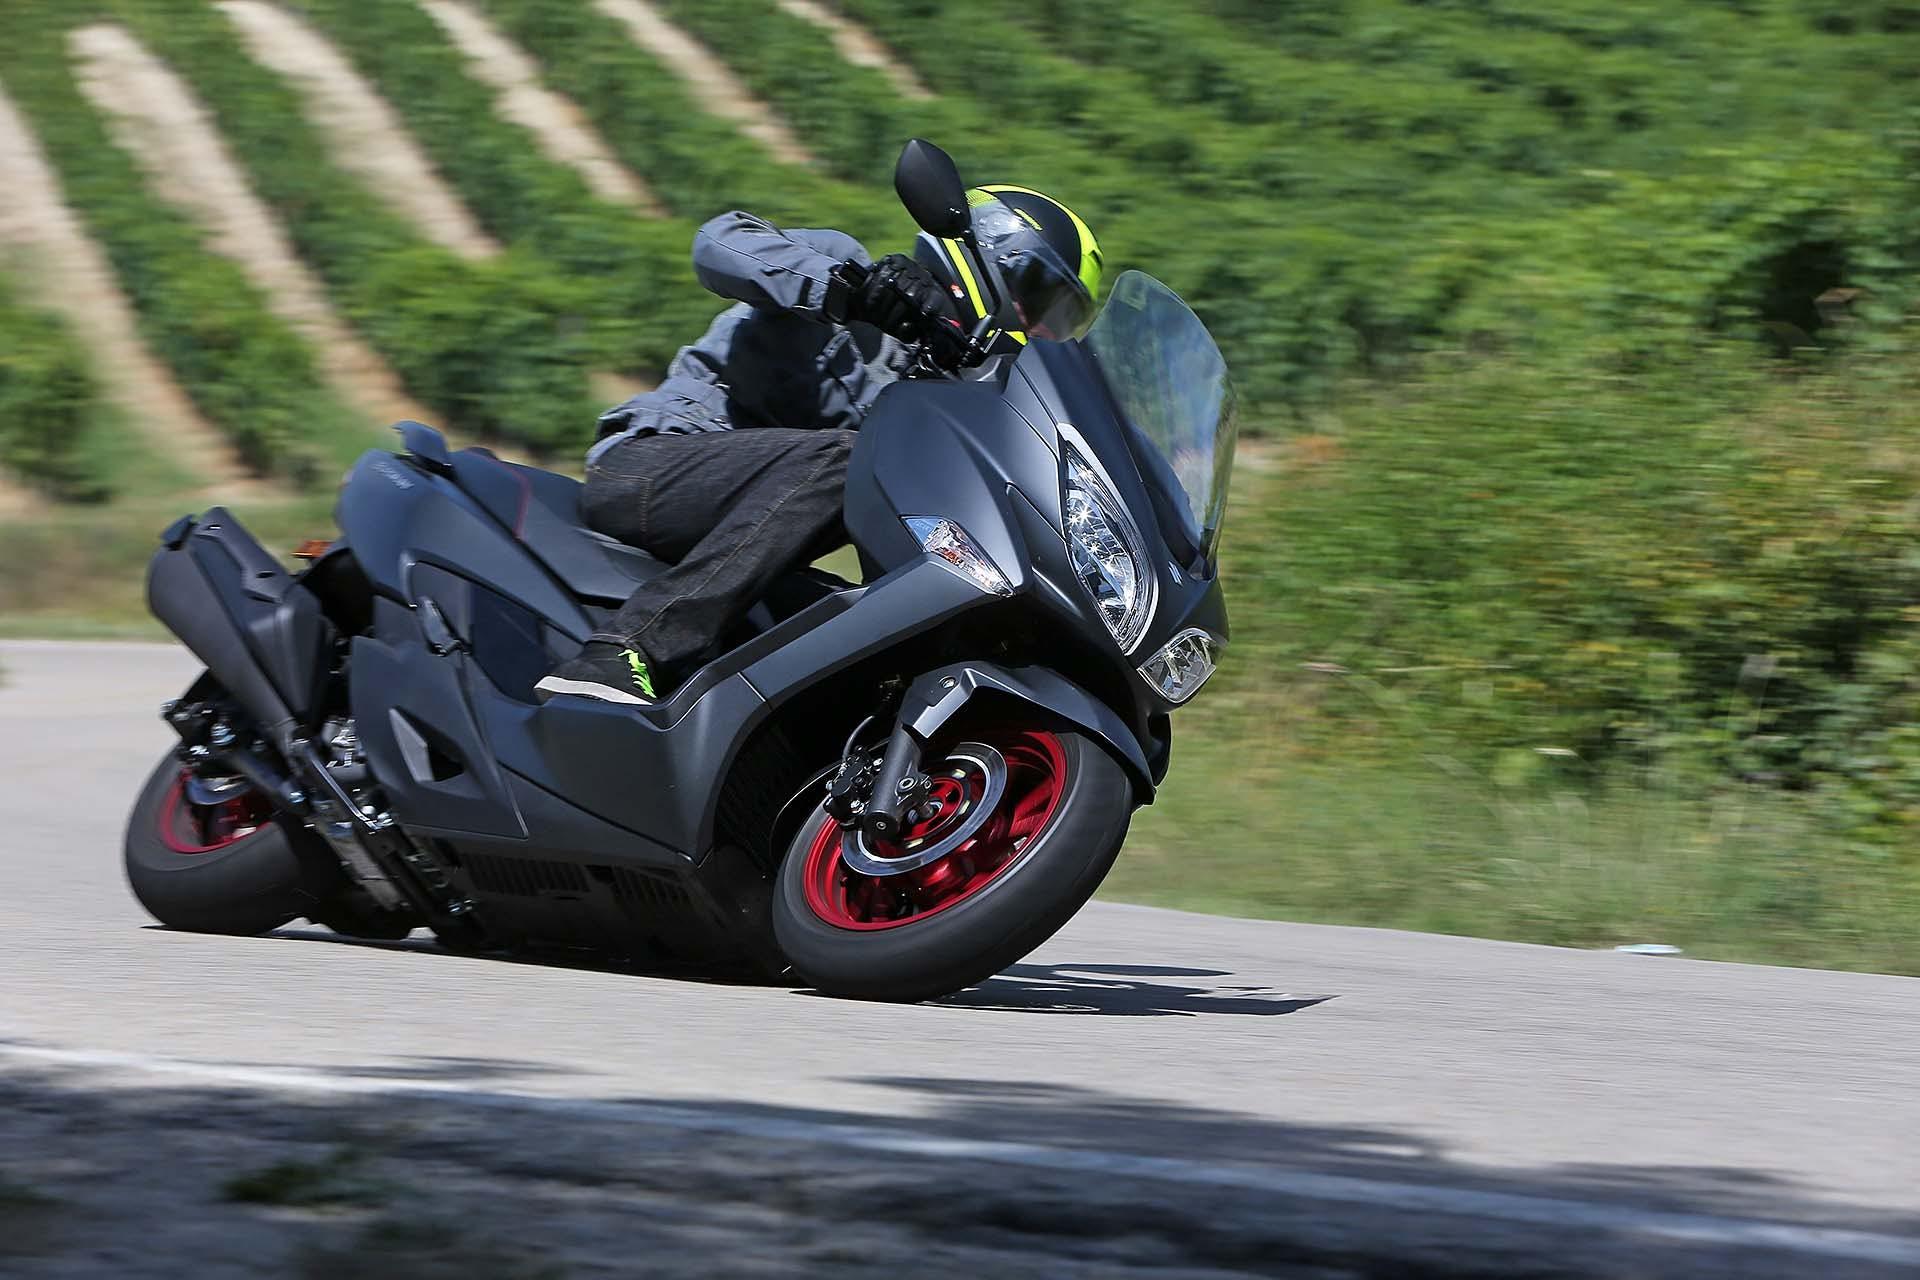 suzuki burgman 400 scooter nero laterale